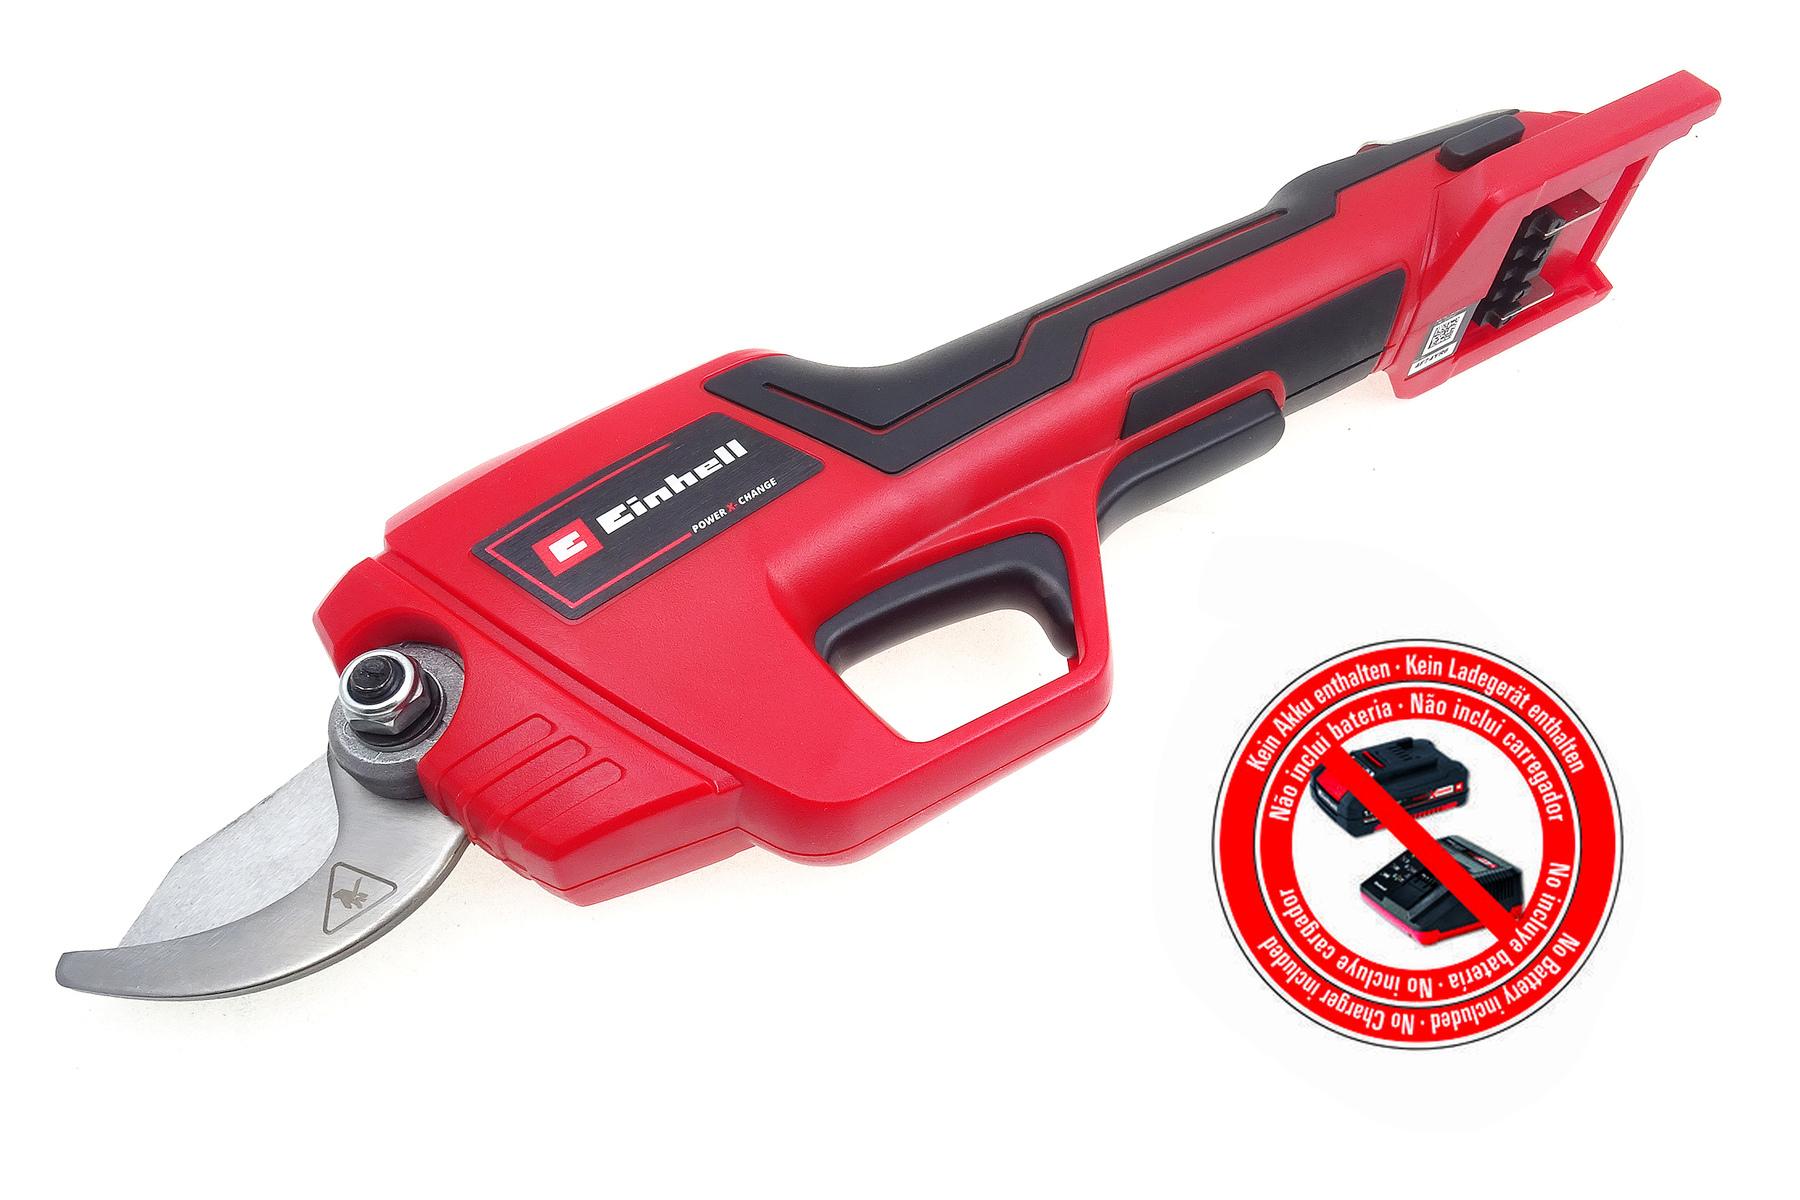 Aku zahradnické nůžky - Einhell Expert GE-LS 18 Li-Solo Power X-Change